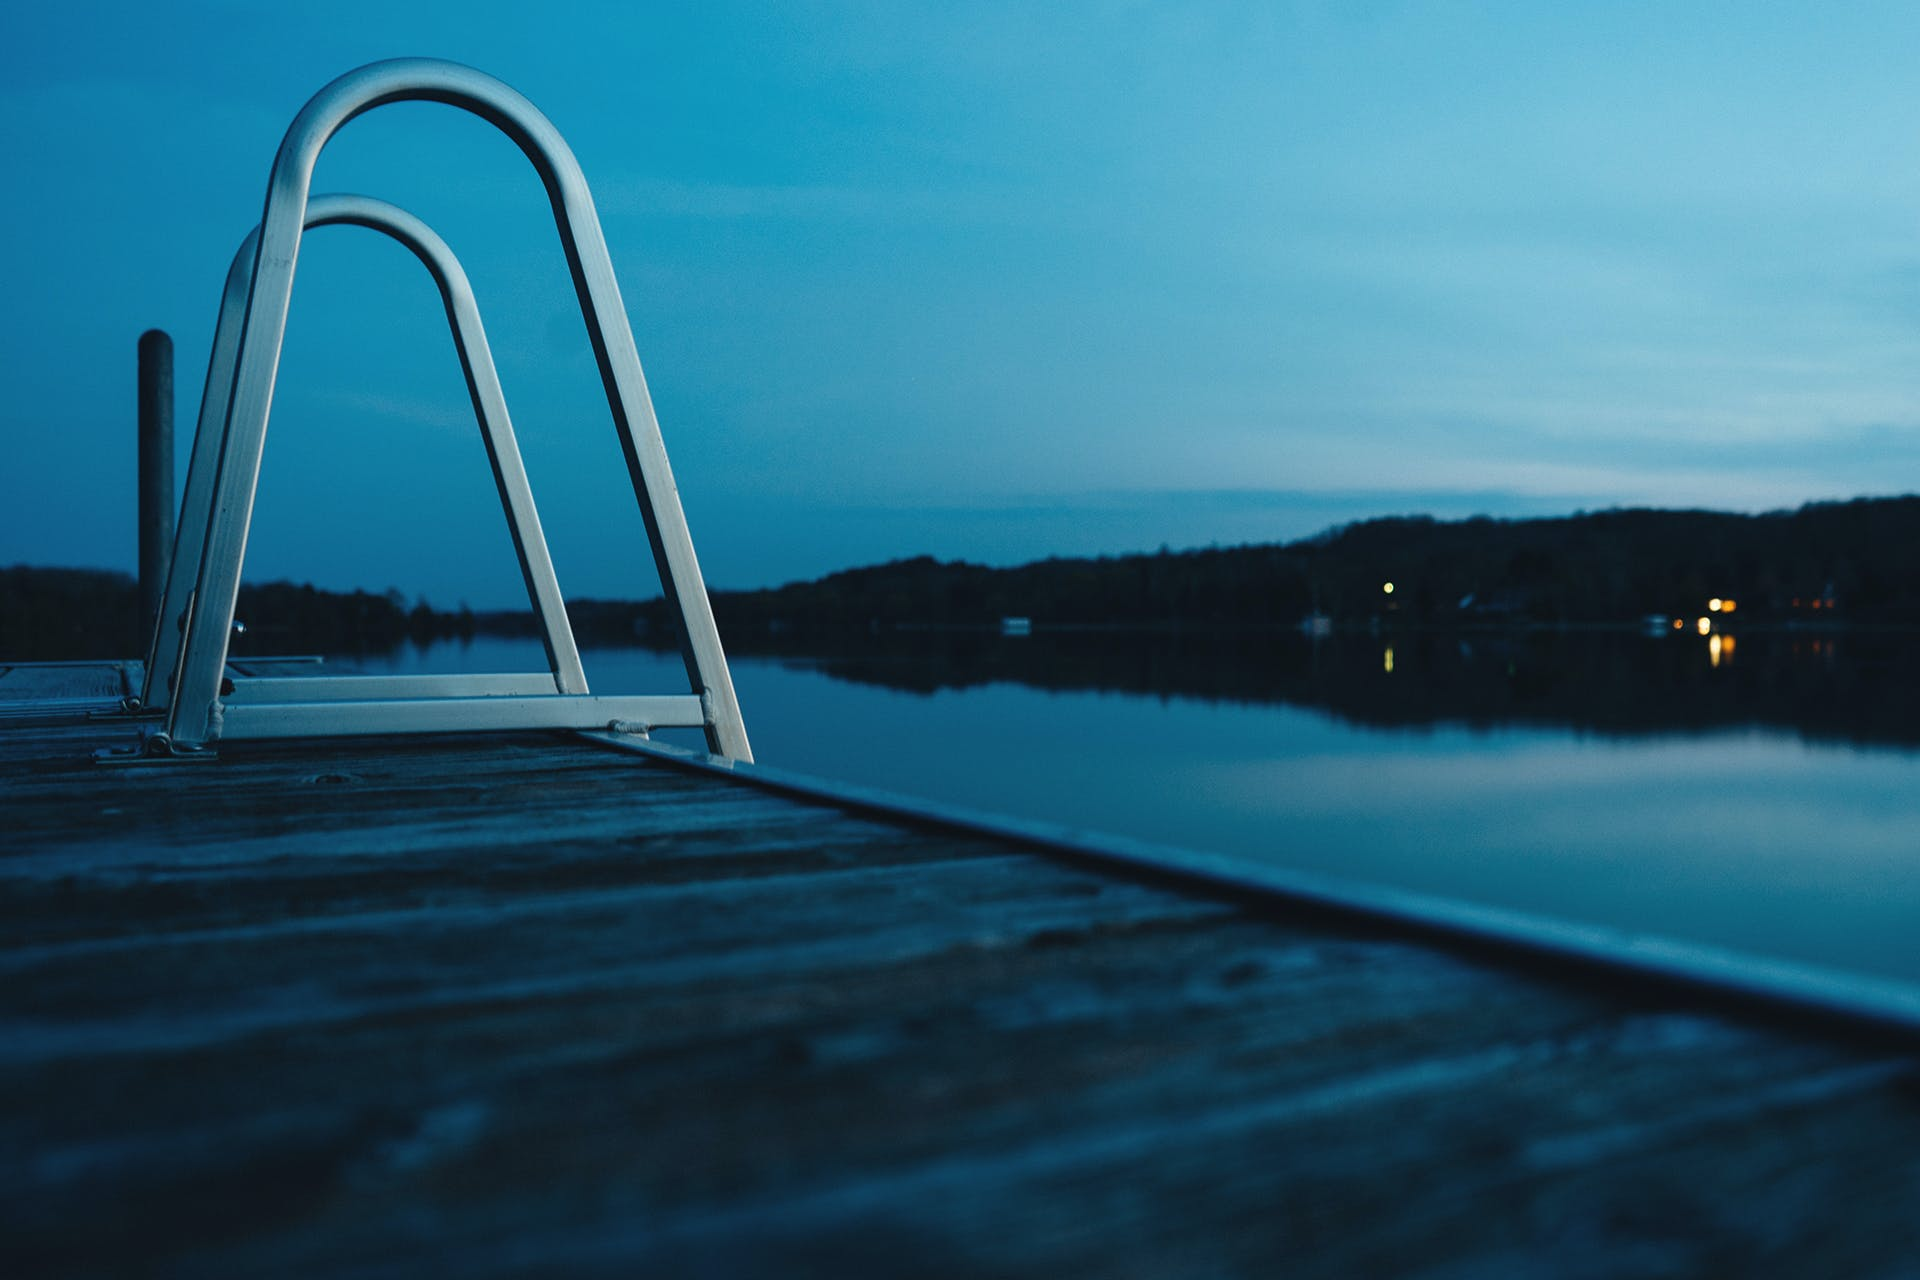 Stainless Steel Side Ladder Near Body of Water